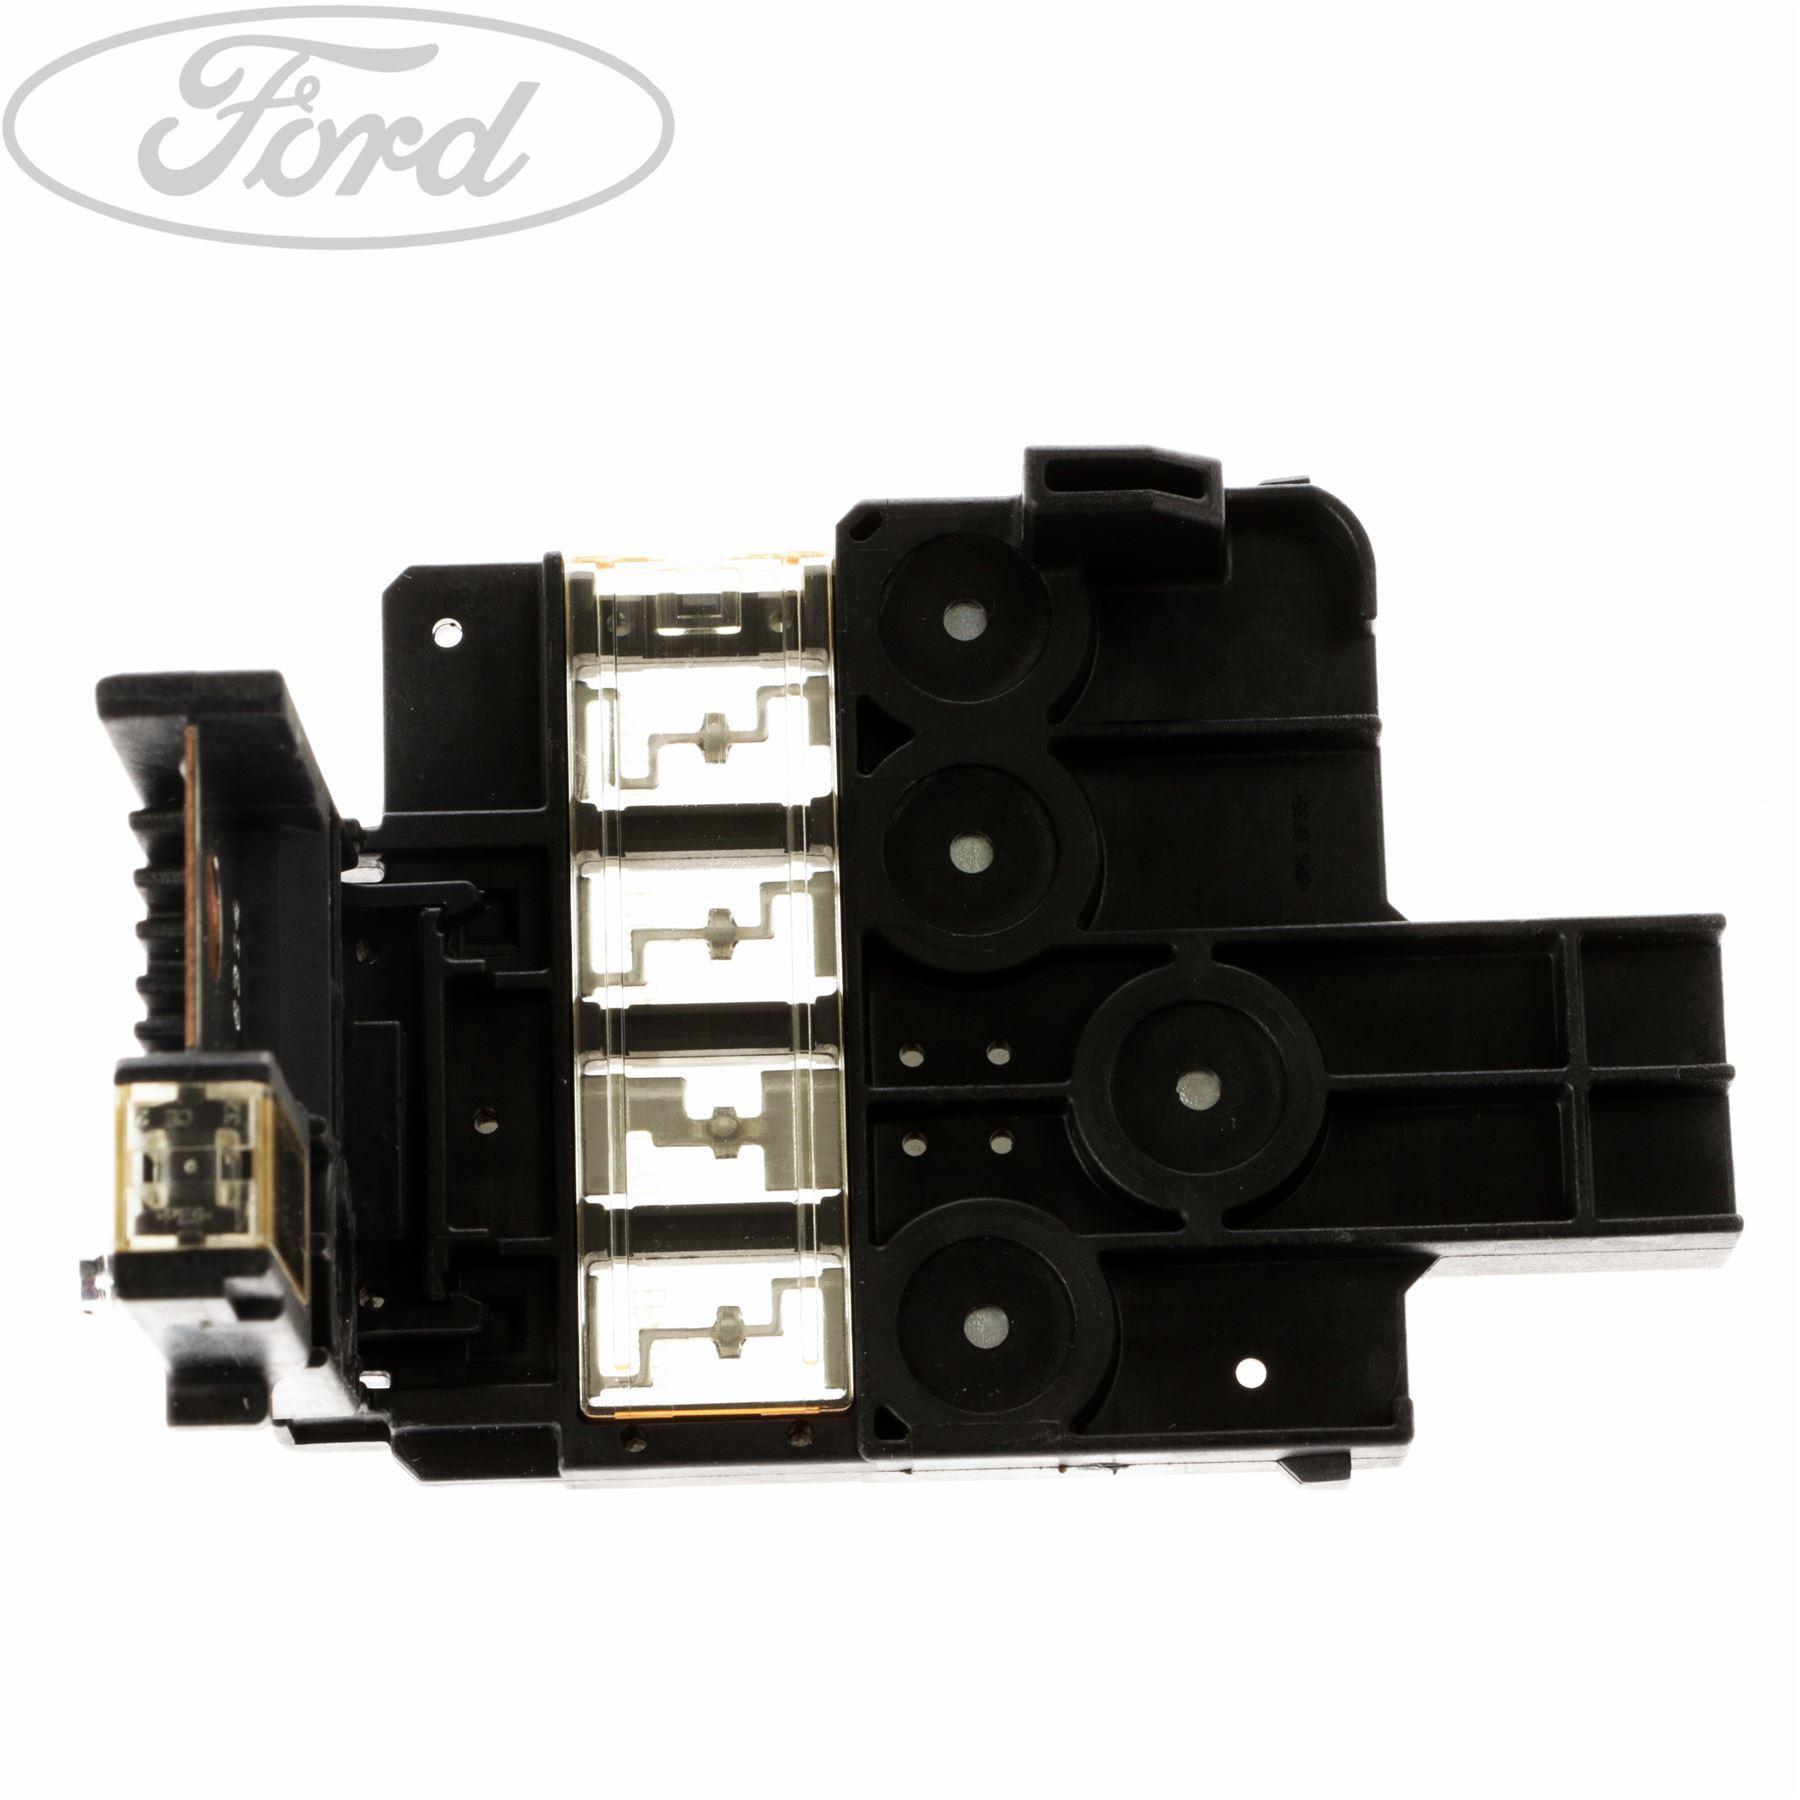 Genuine Ford Fiesta Mk7 Fuse Junction Panel 1520976 Ebay Box Diagram